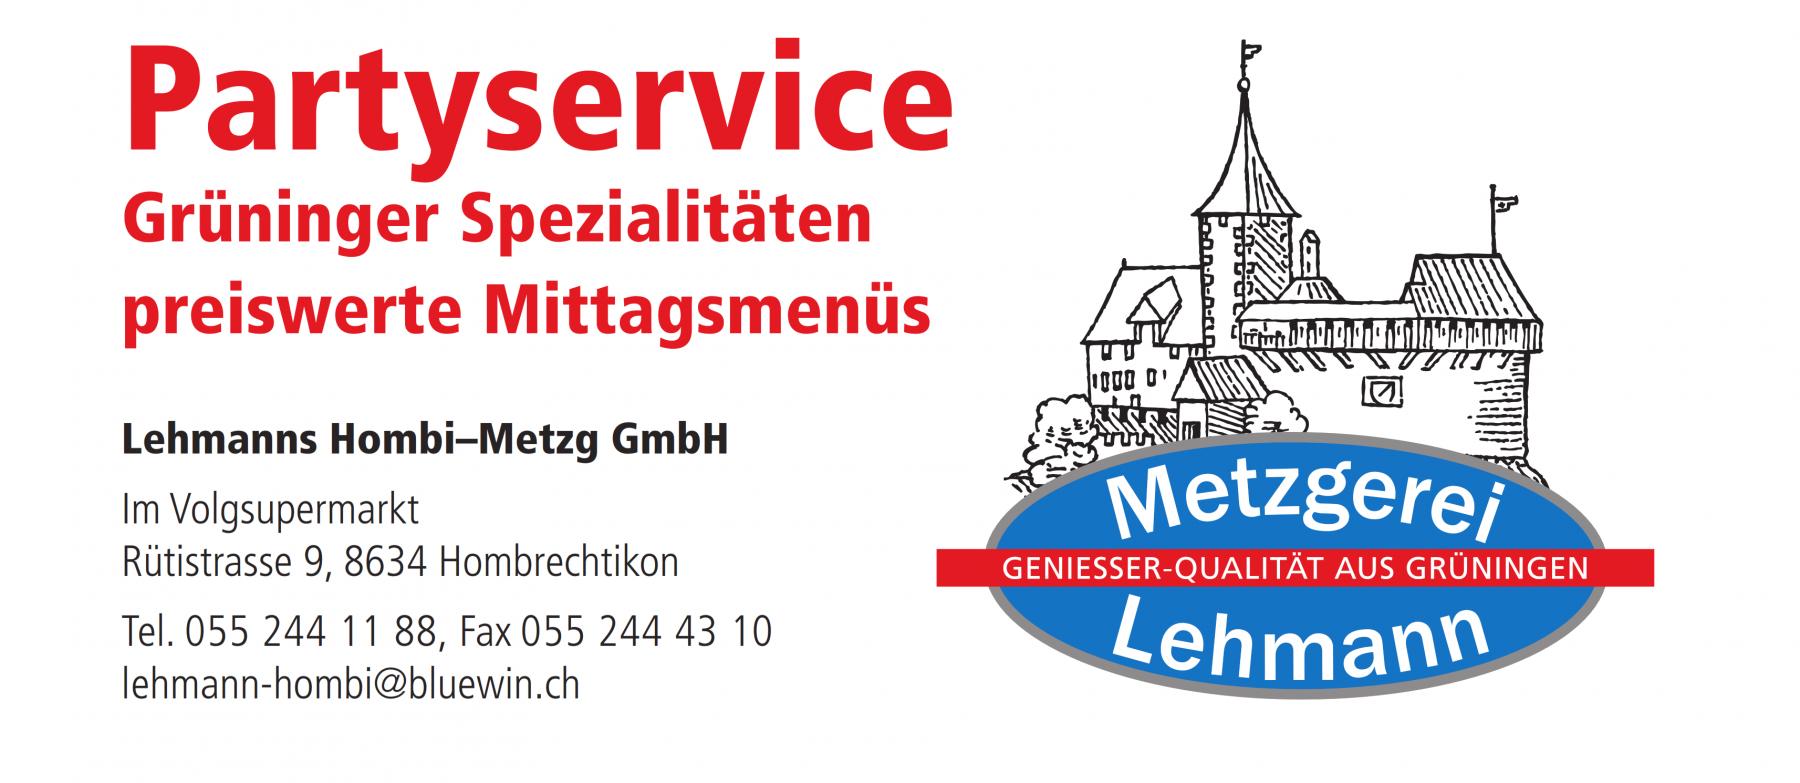 Inserate-Metzgerei-Lehmann_001